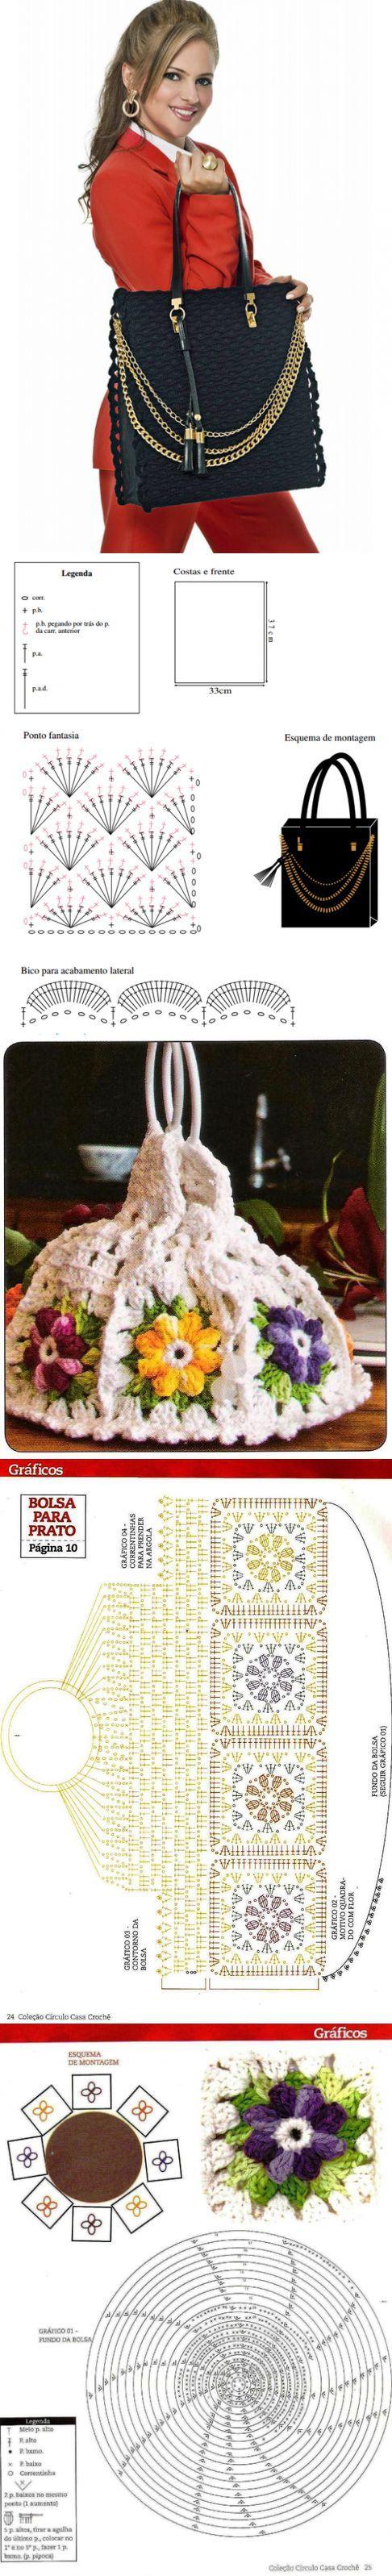 bolso-cartera-saco-crochet-patron-esquema-otakulandia.es (4)